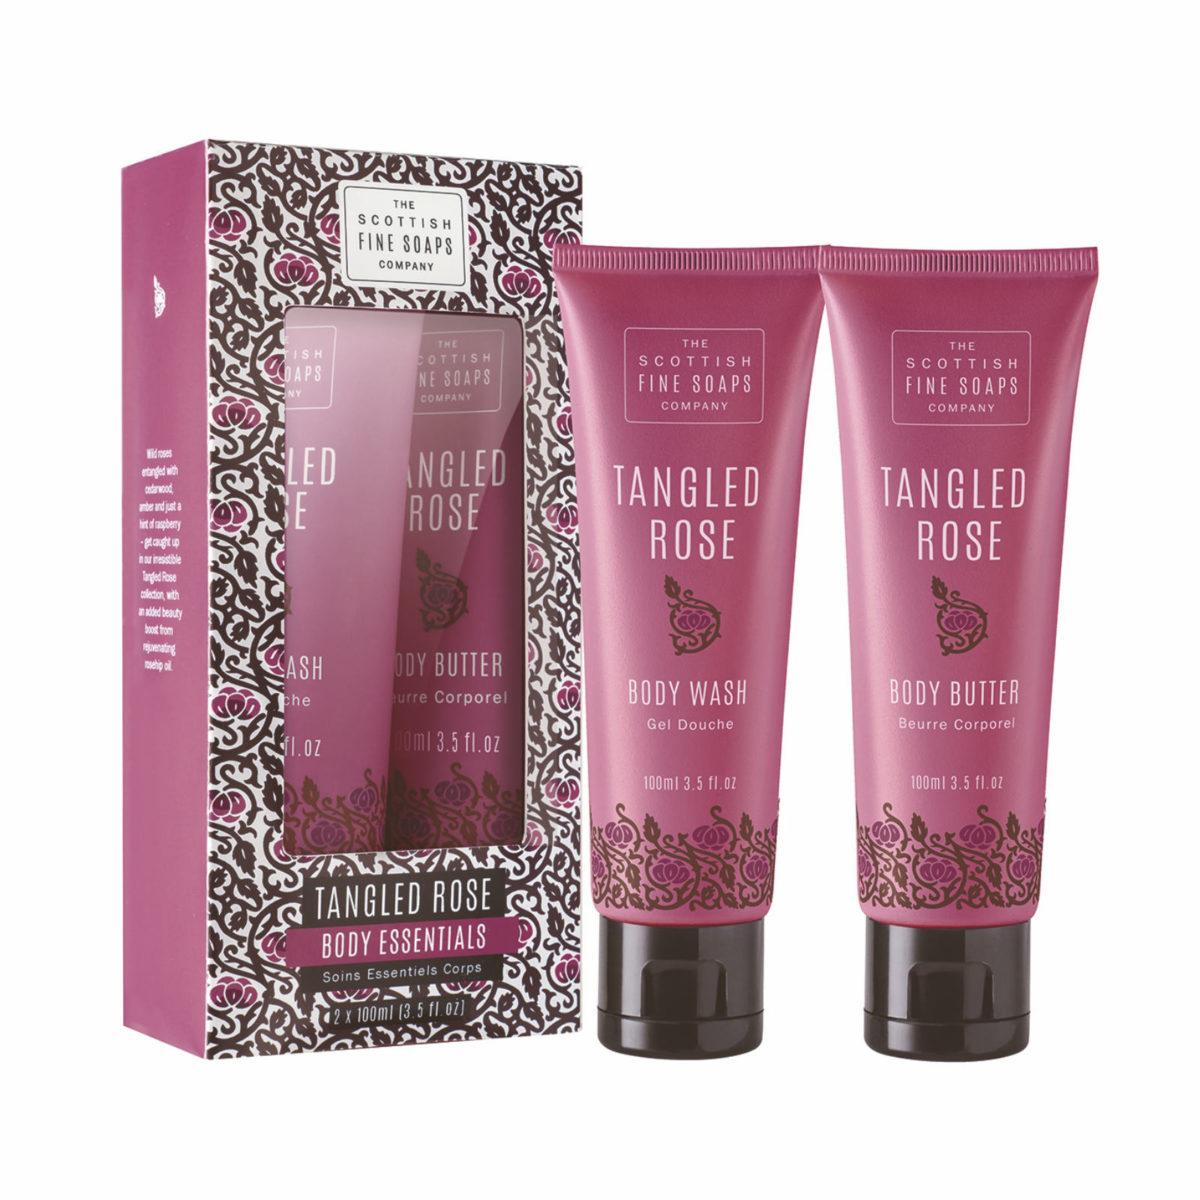 Tangled Rose Body Essentials